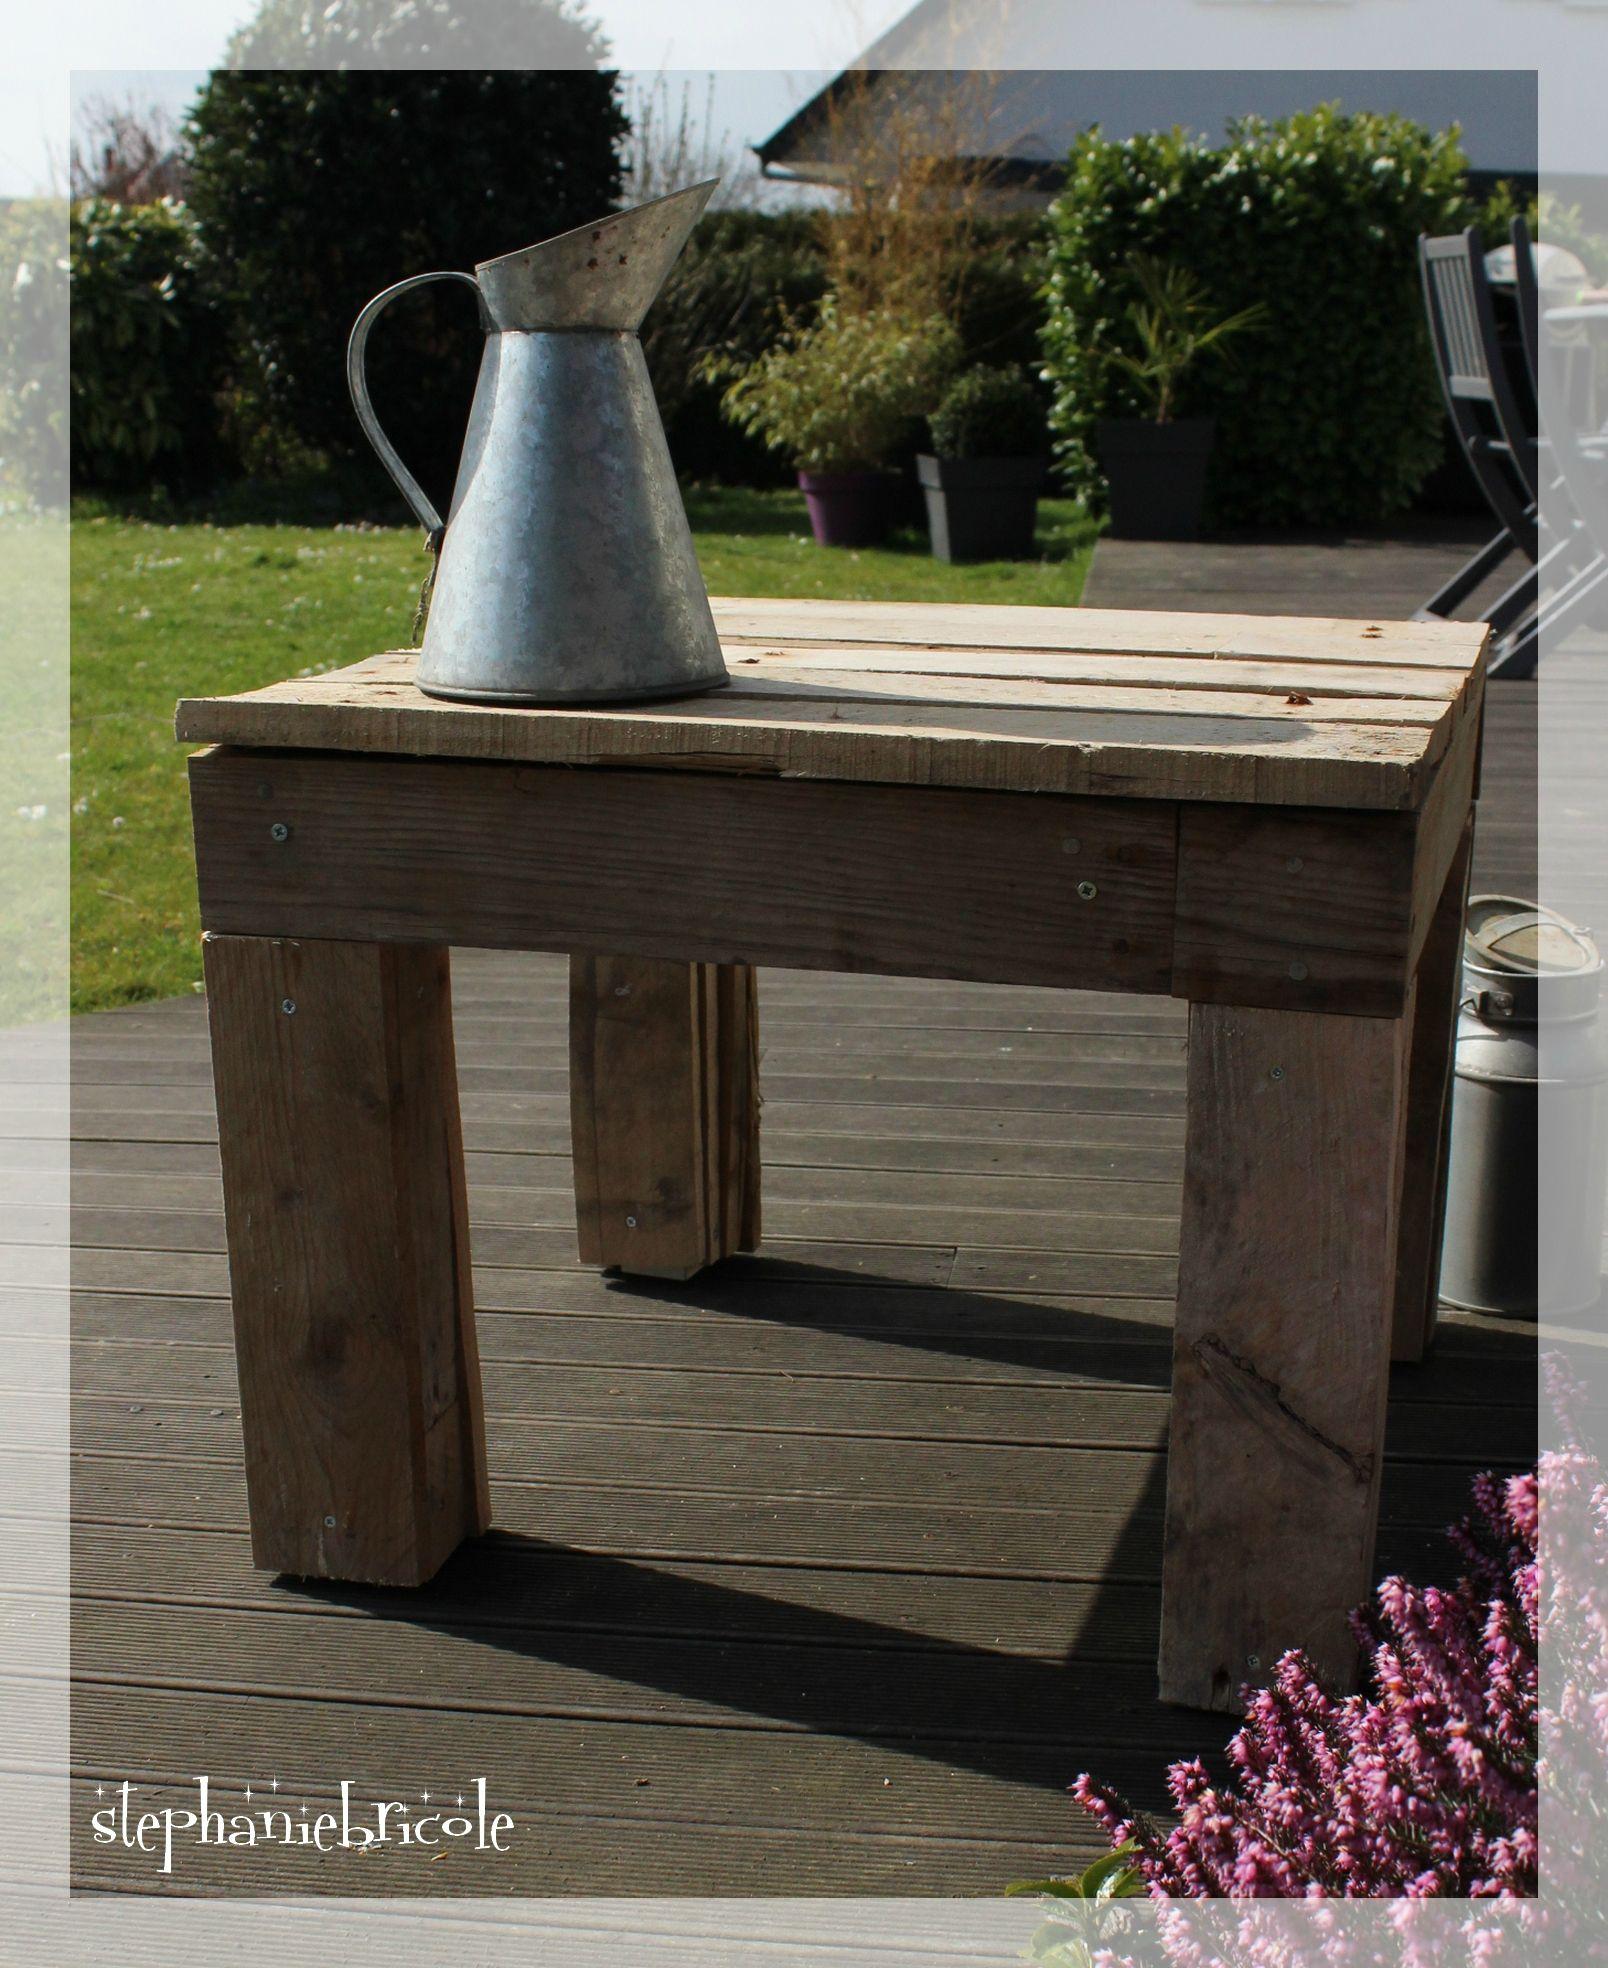 f00860955e079eee757eb4aba61841d5 Impressionnant De Ikea Table Exterieur Conception